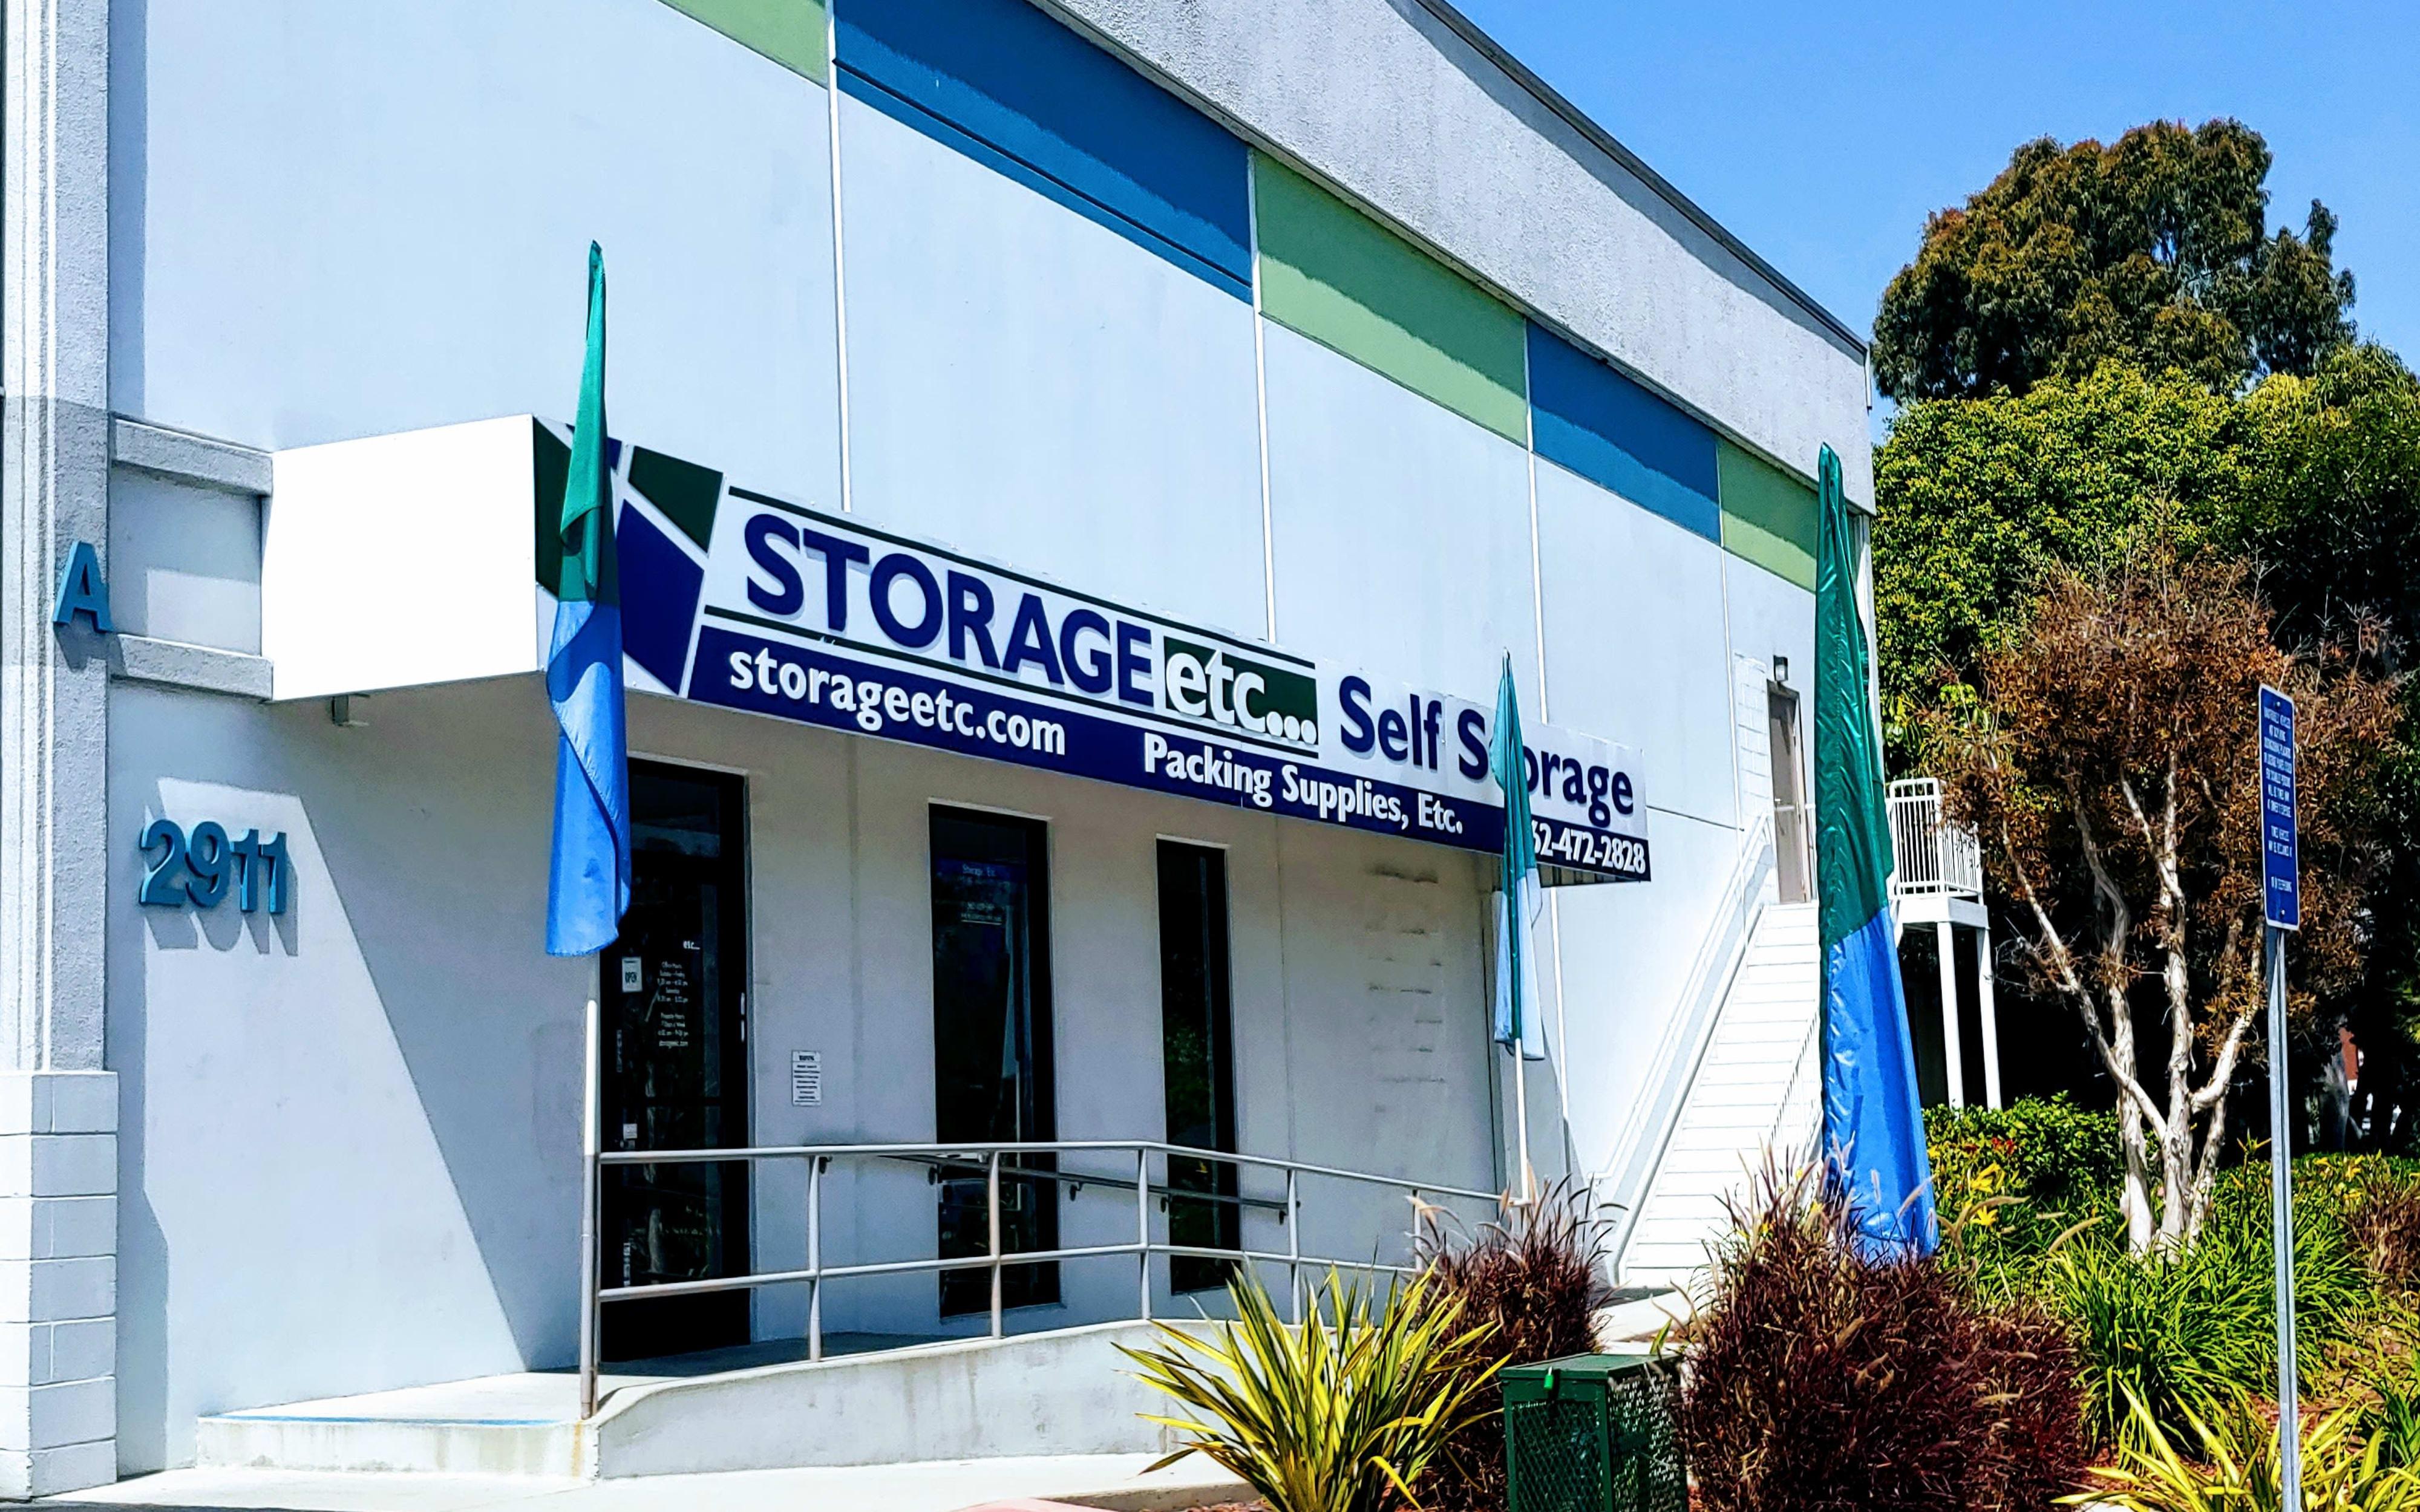 Self storage in Long Beach CA